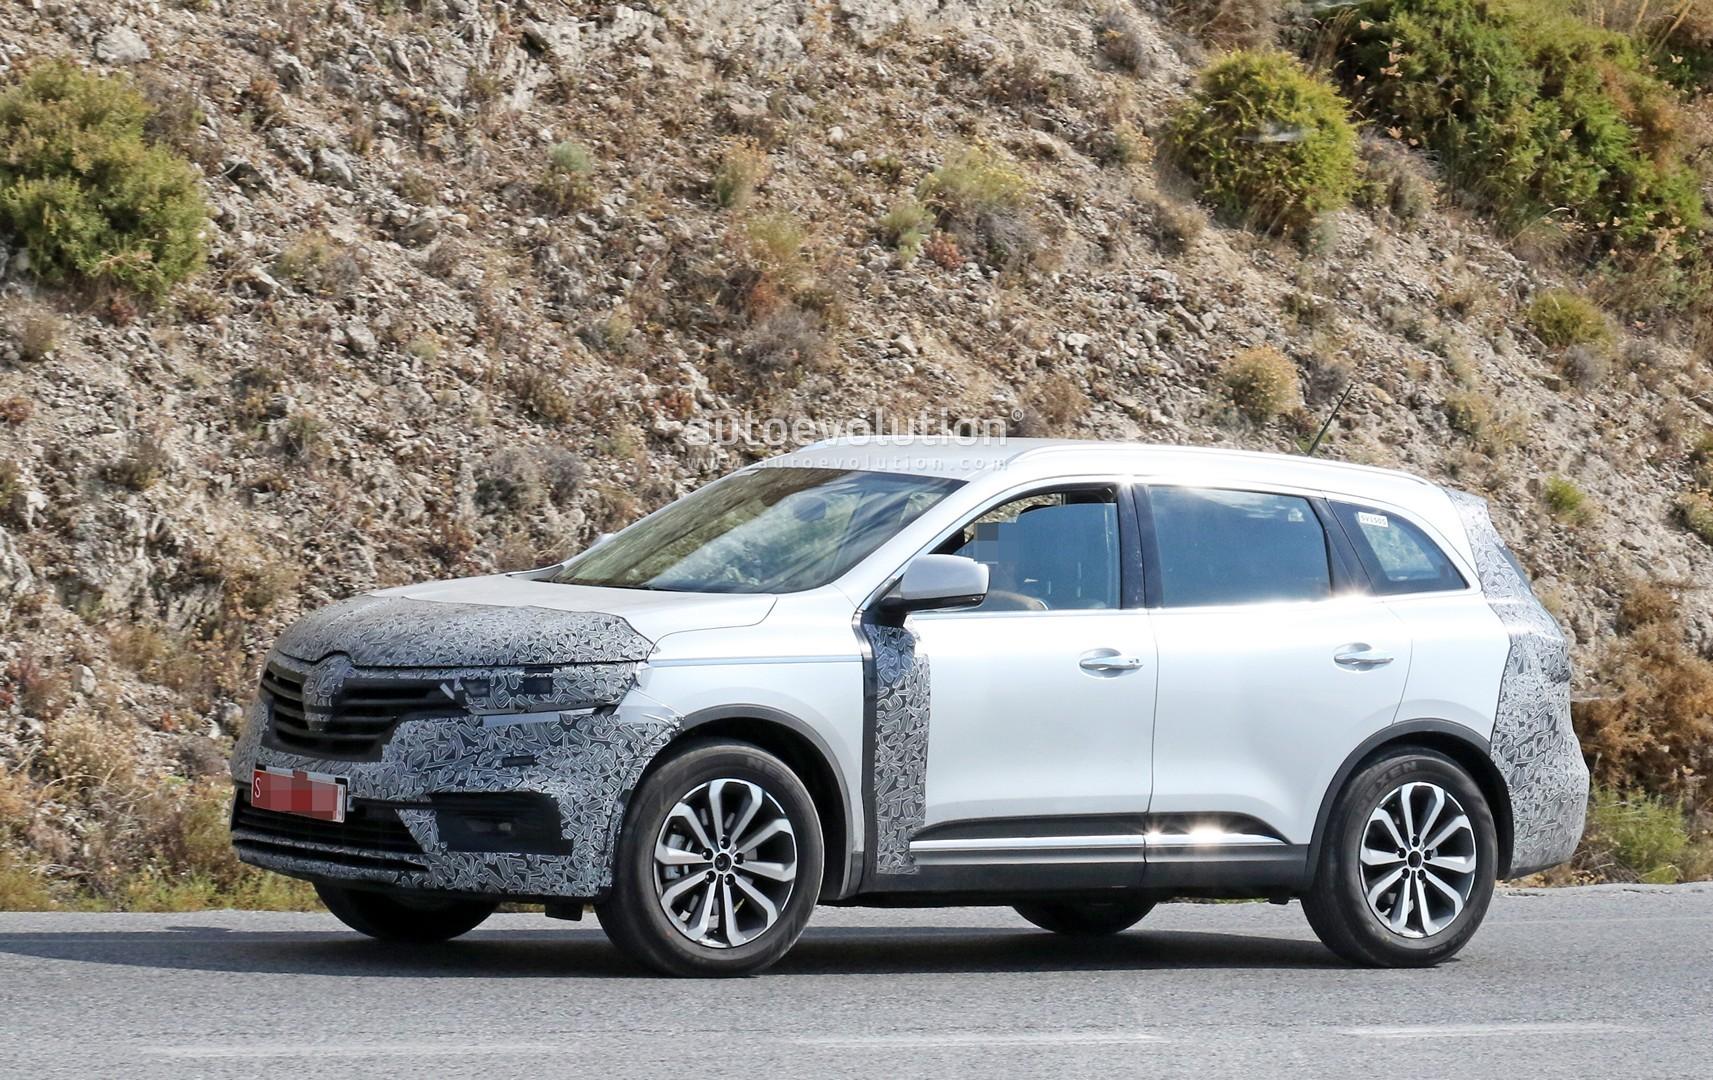 Renault Koleos Facelift Makes Spyshots Debut Autoevolution